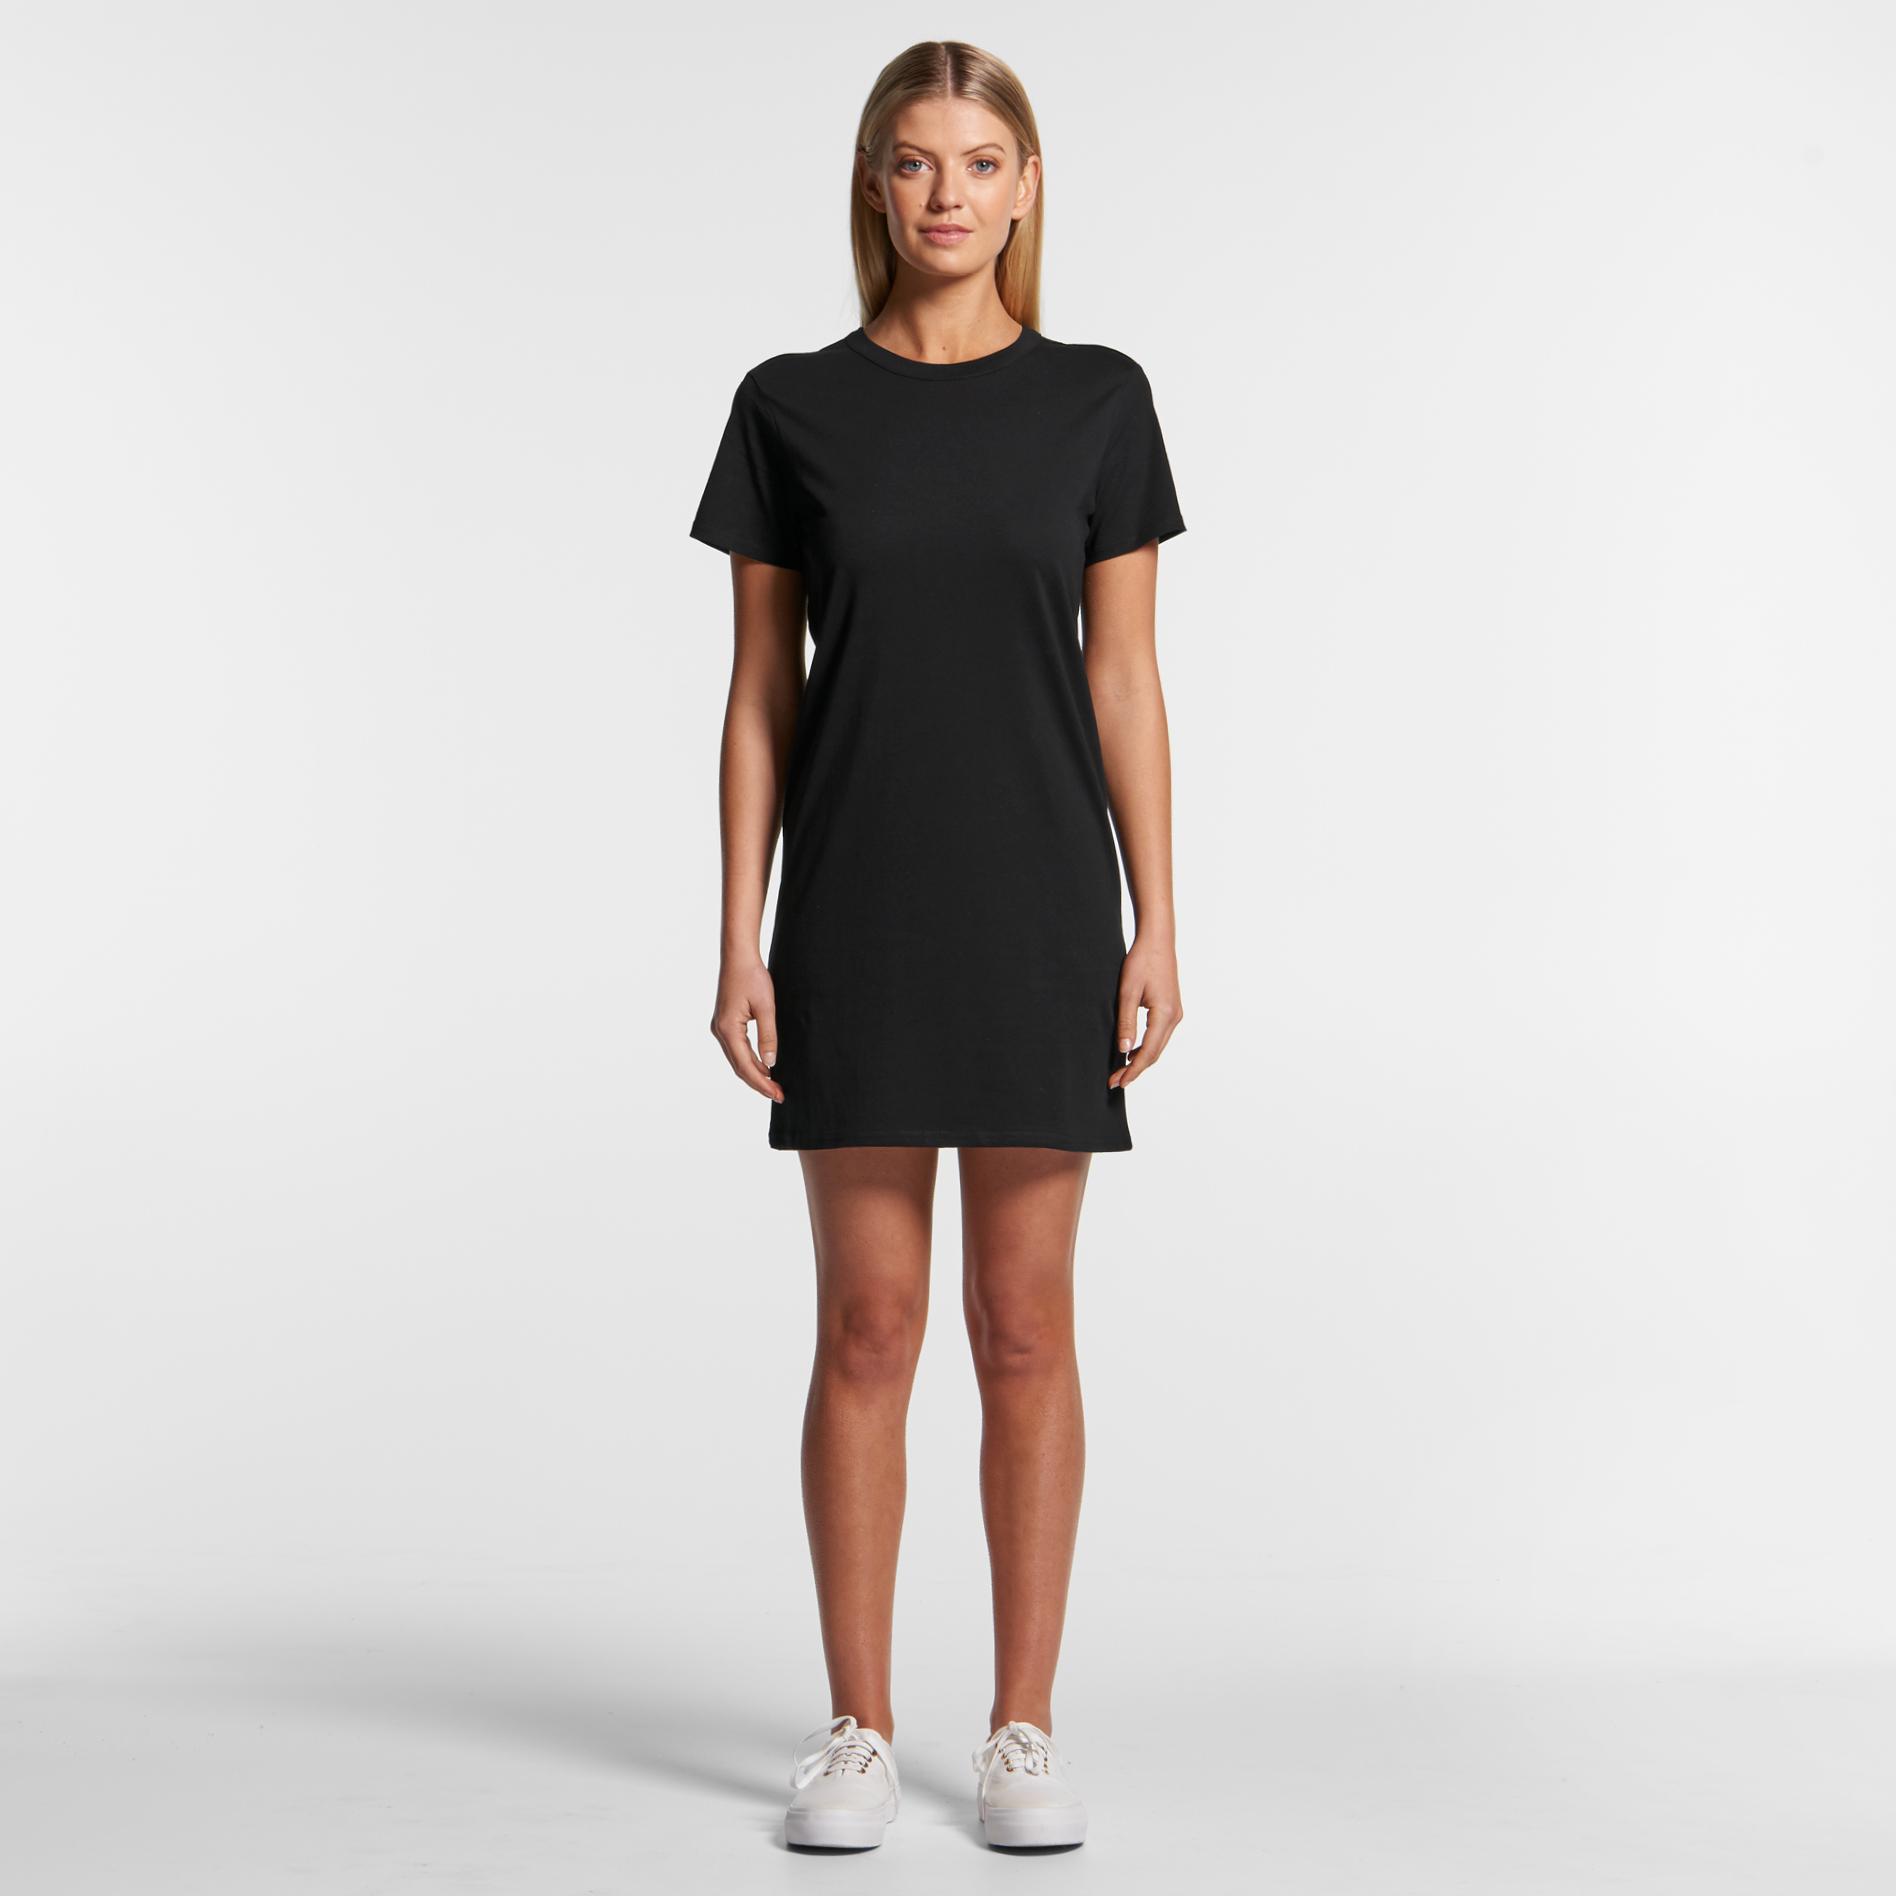 Mika Short Sleeve Dress